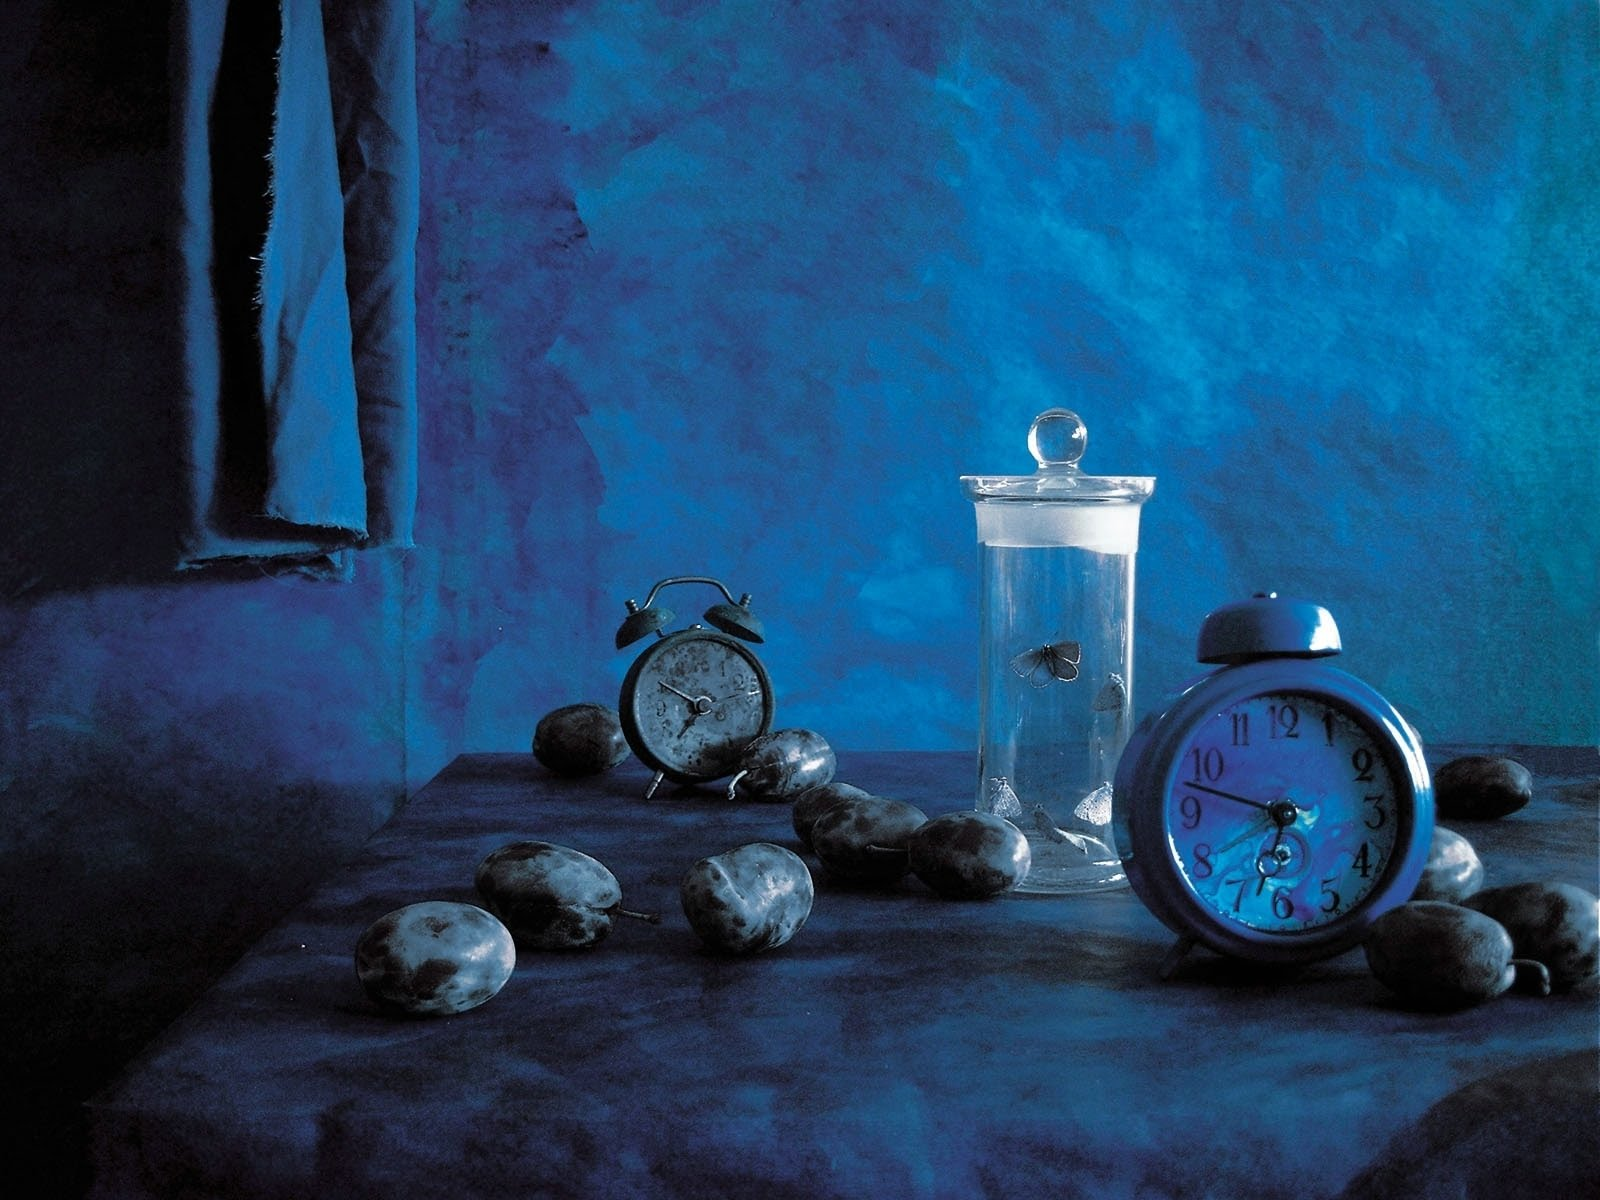 http://3.bp.blogspot.com/_0fvCOMn2z78/TGJq1Z1RwnI/AAAAAAAAEAE/3RO9-OdUBnw/s1600/Wallpaper.+Blue+Room.jpg